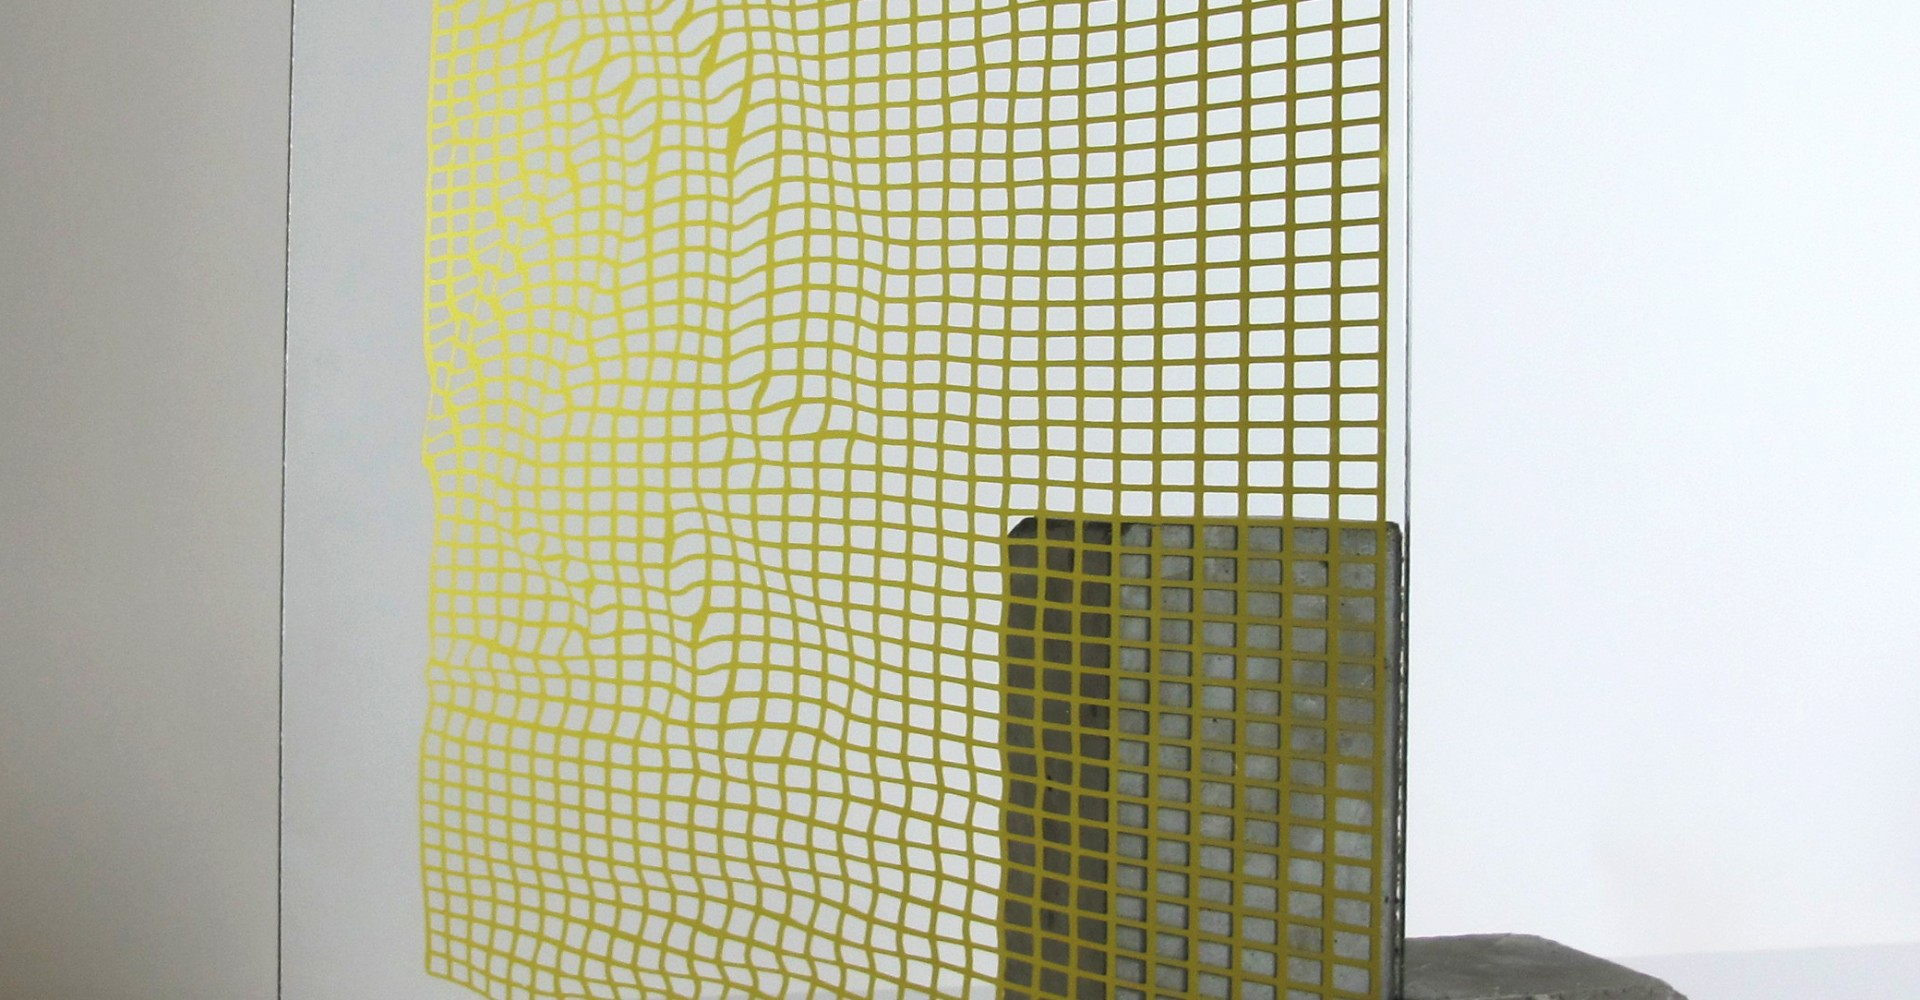 Samuel Padfield 'Rippled grid study' 2018